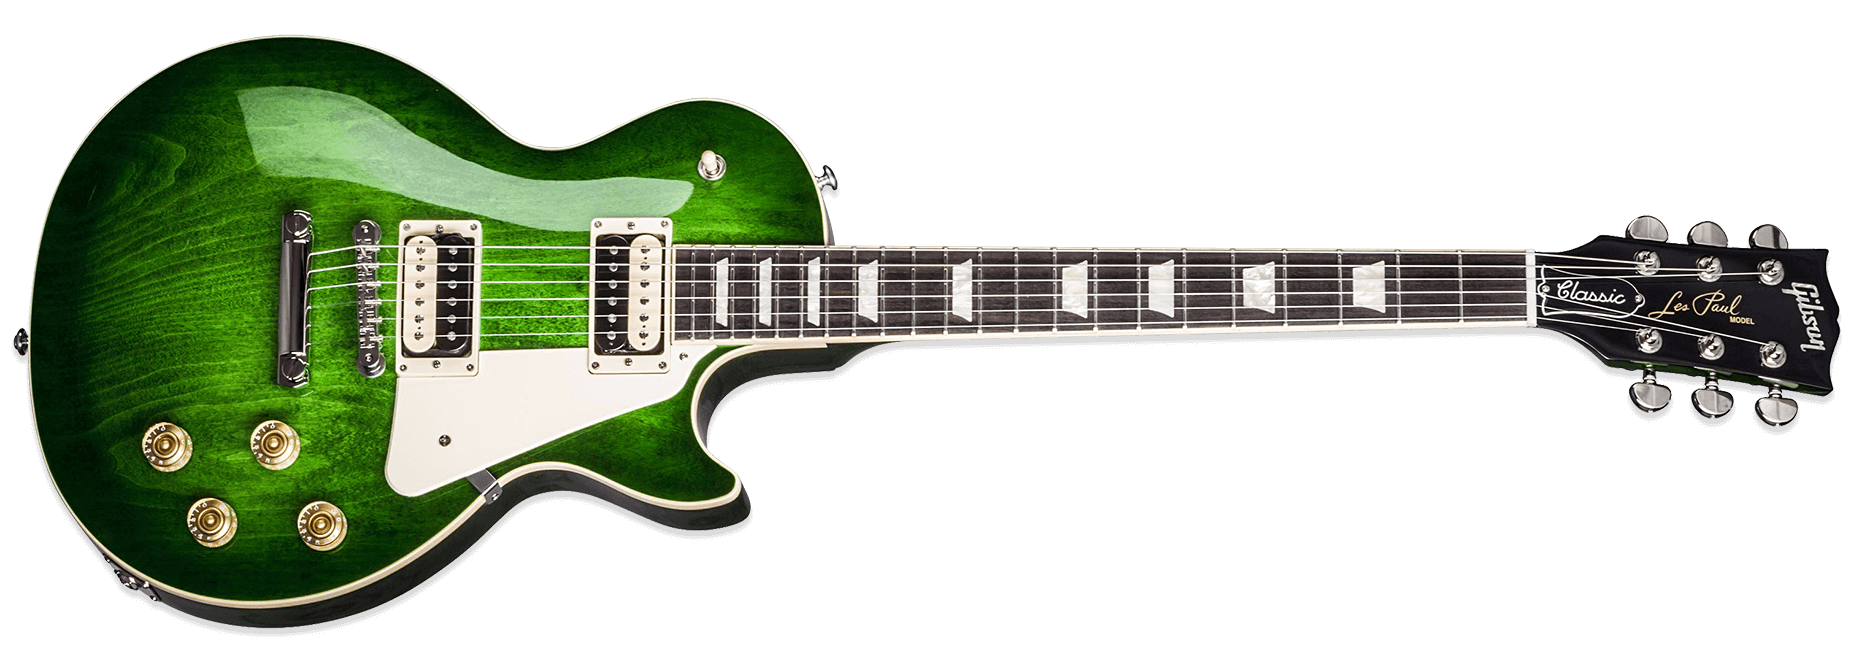 Gibson Les Paul Classic 2017 T Green Ocean Burst